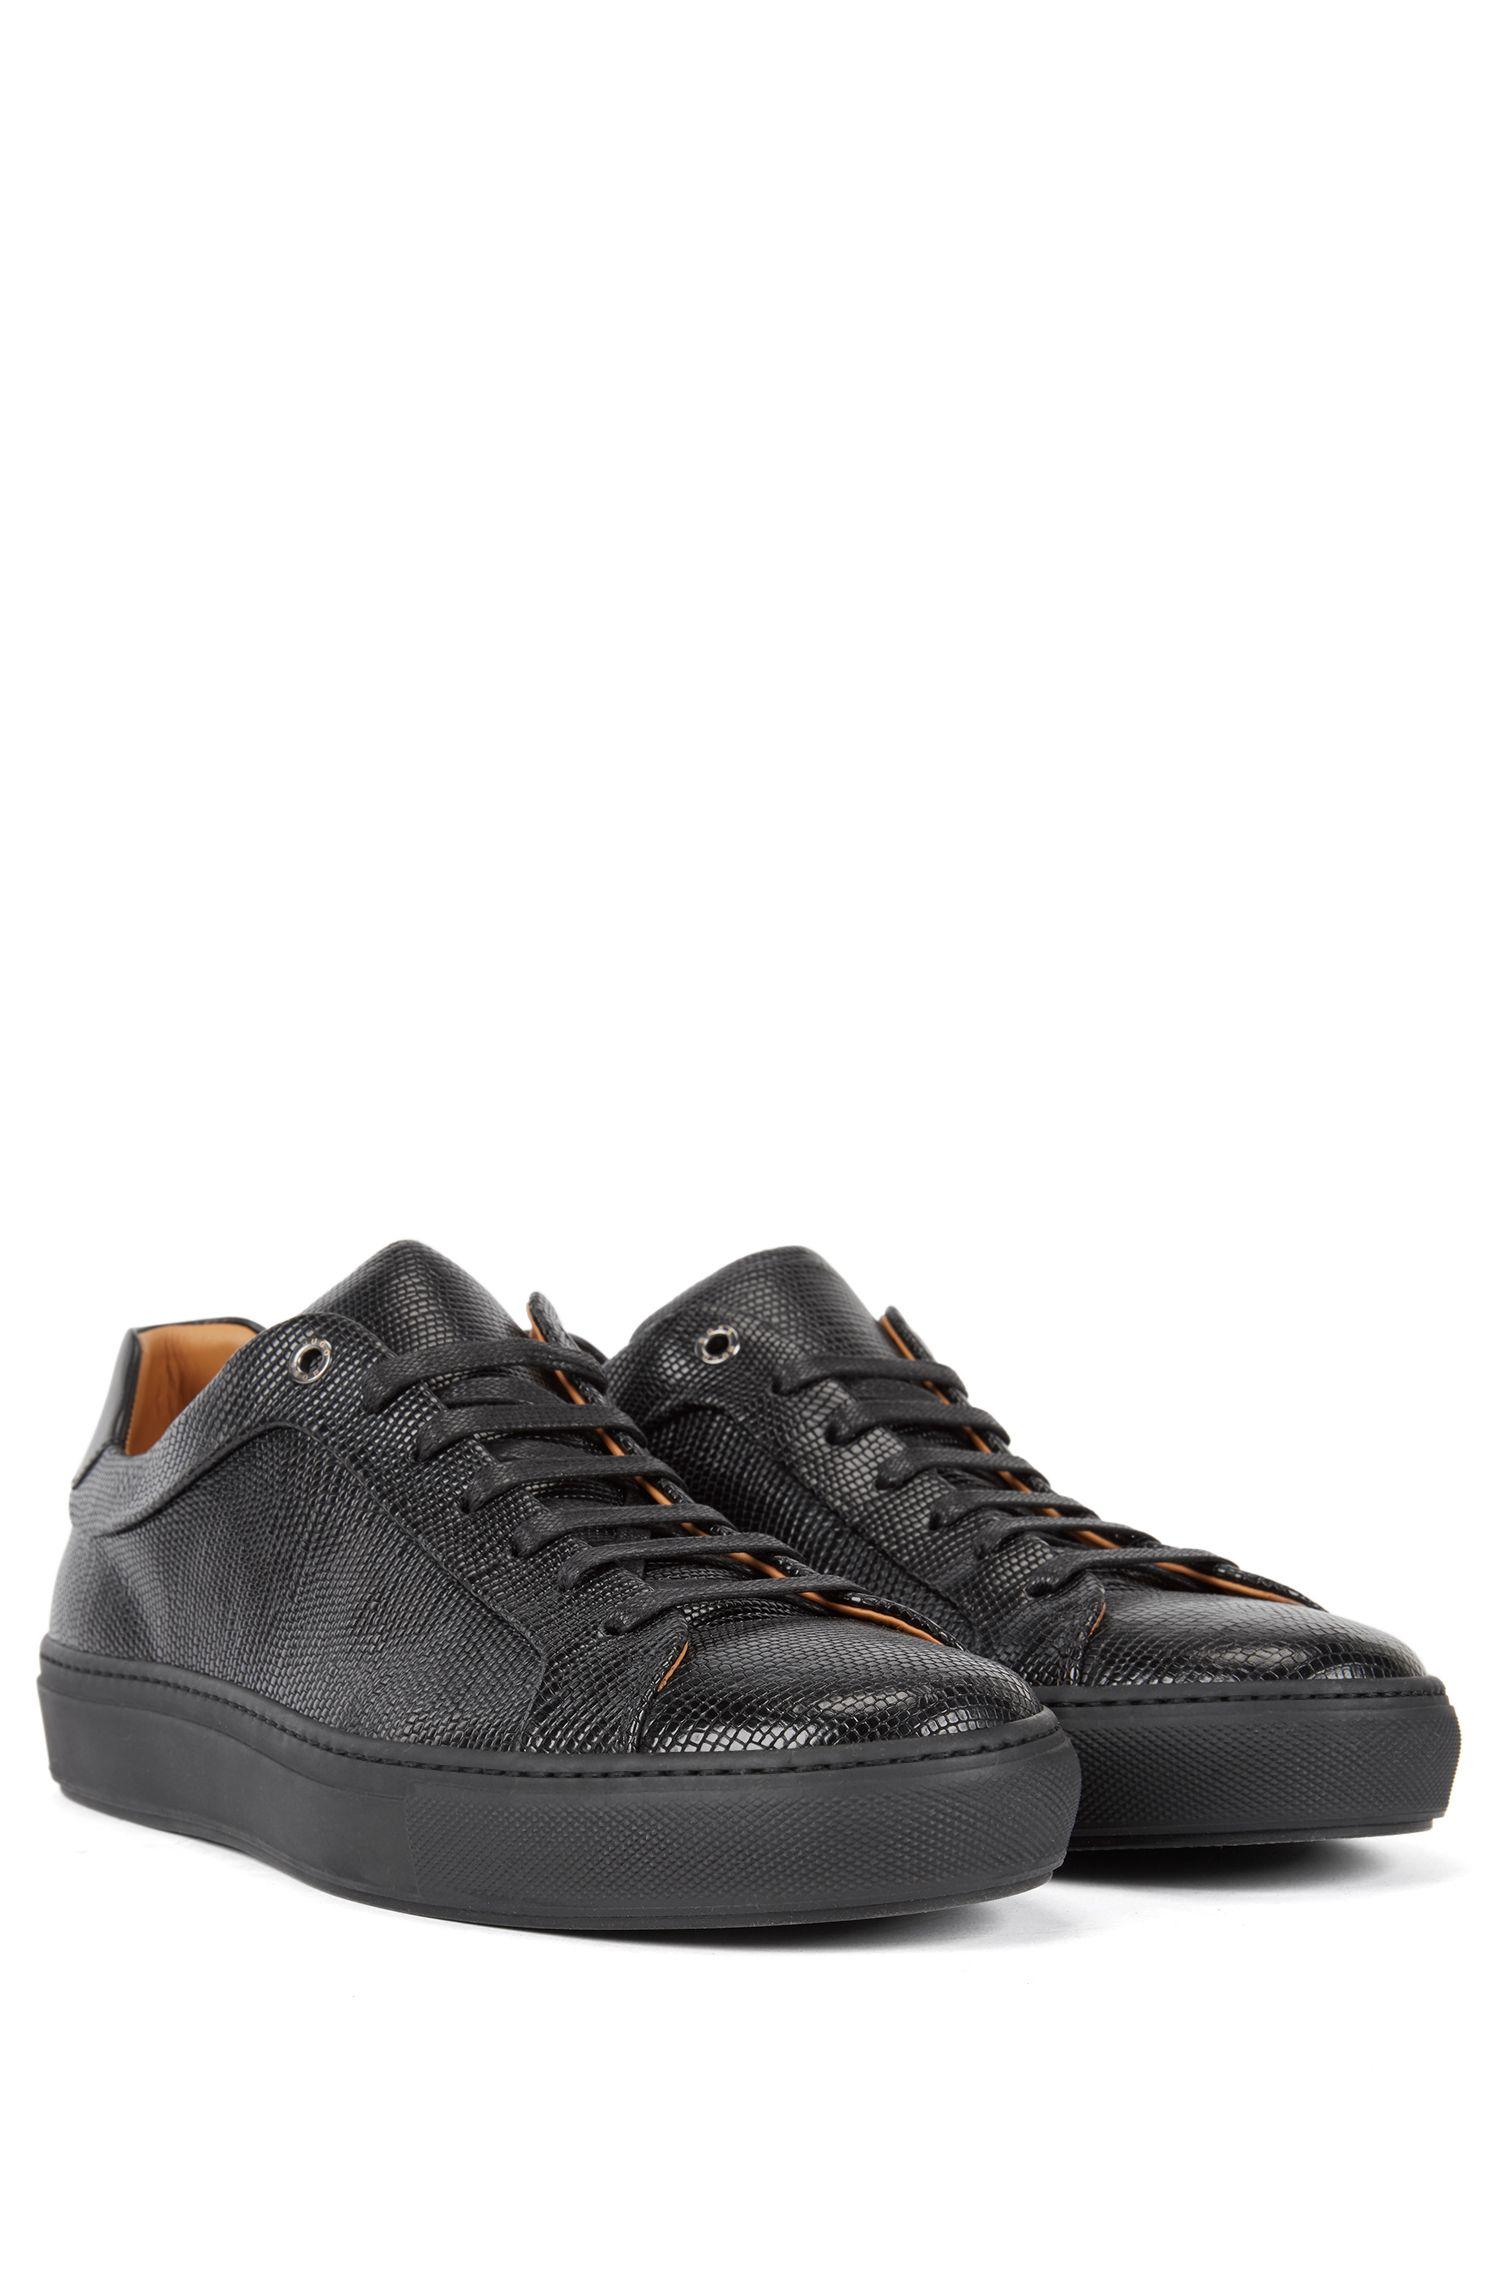 Sneakers aus geprägtem Leder im Tennis-Stil, Schwarz